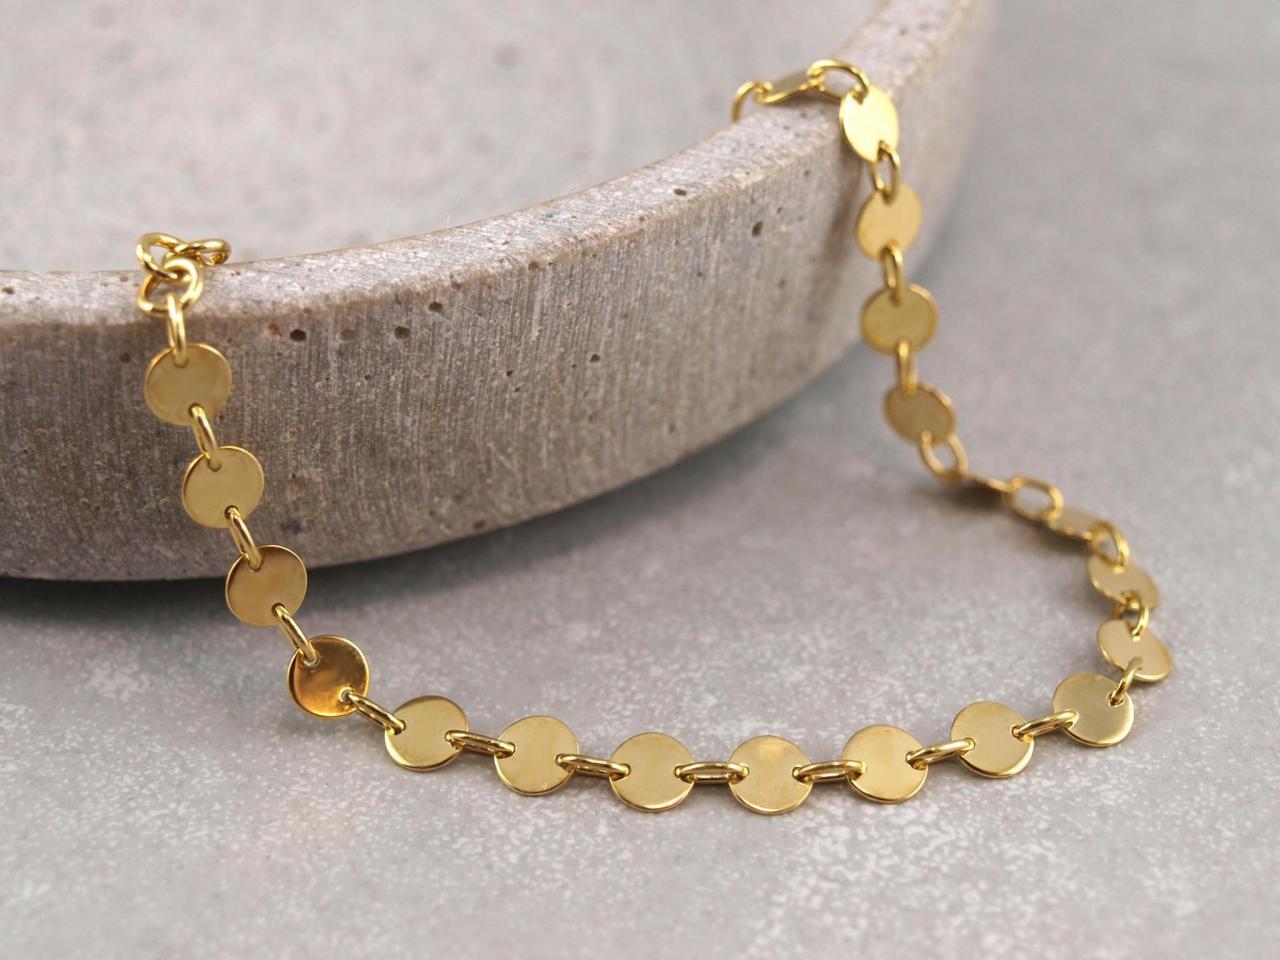 Armband aus 5 mm Plaettchen, Dots, Silber Vergoldet, Groessenverstellbar